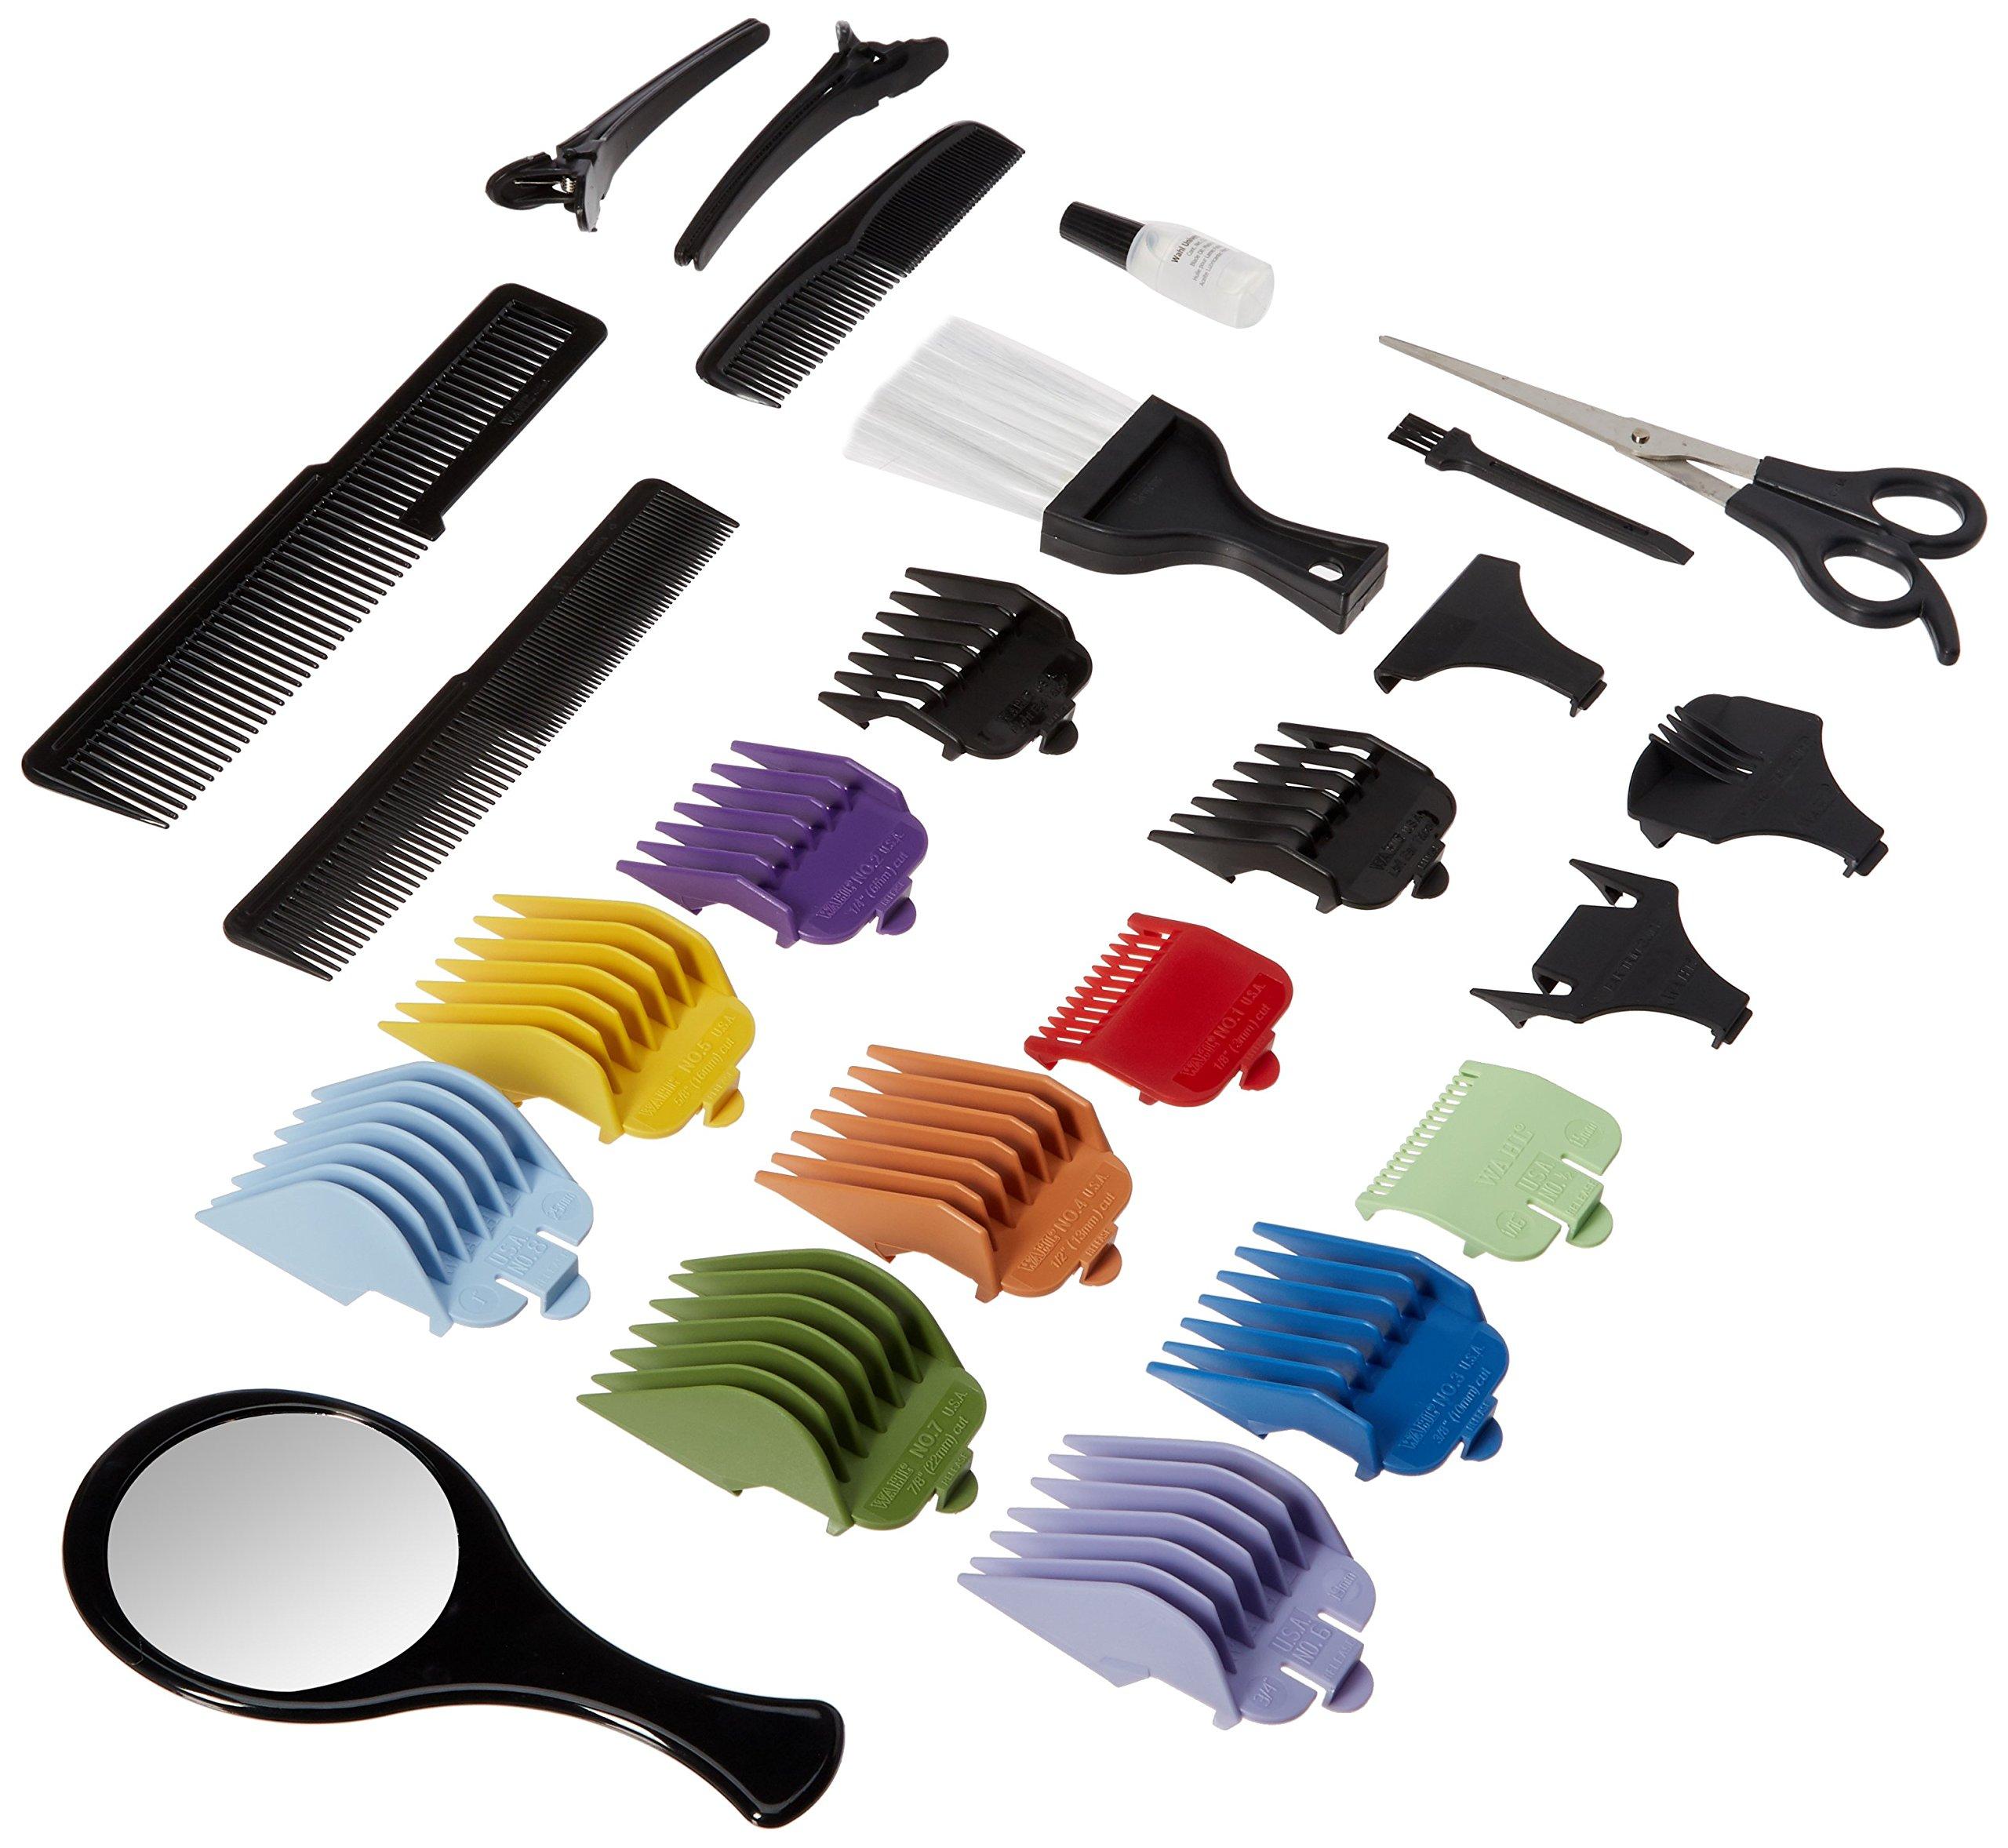 WAHL Hair Trim Kit - DELUXECOLORPRO